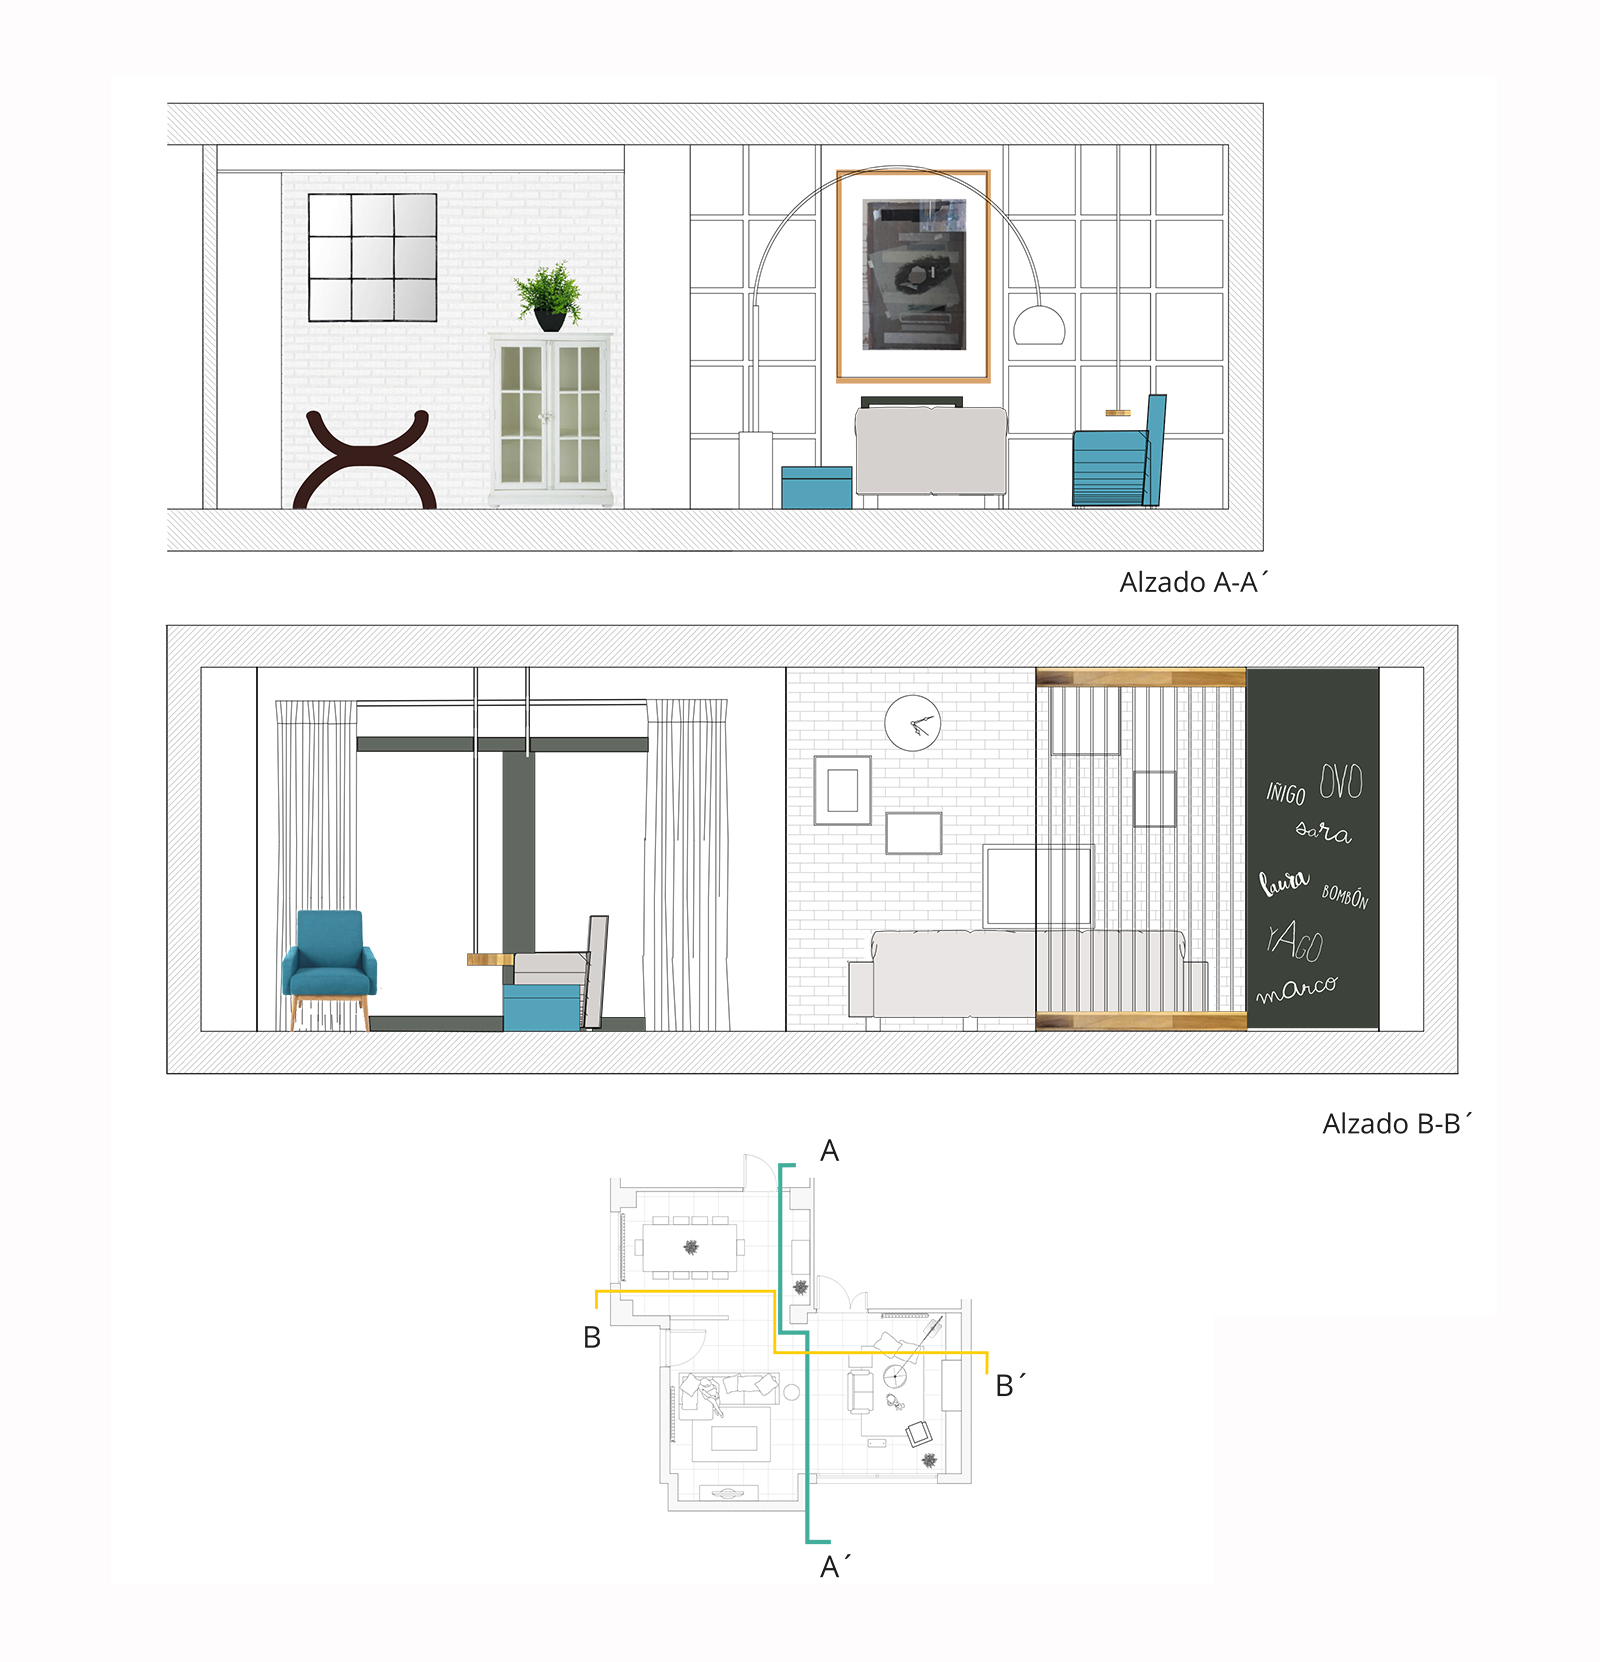 Proyectos_Deco_16-01_2016-02_Piso Sara_Planos 300316 (1).cdr